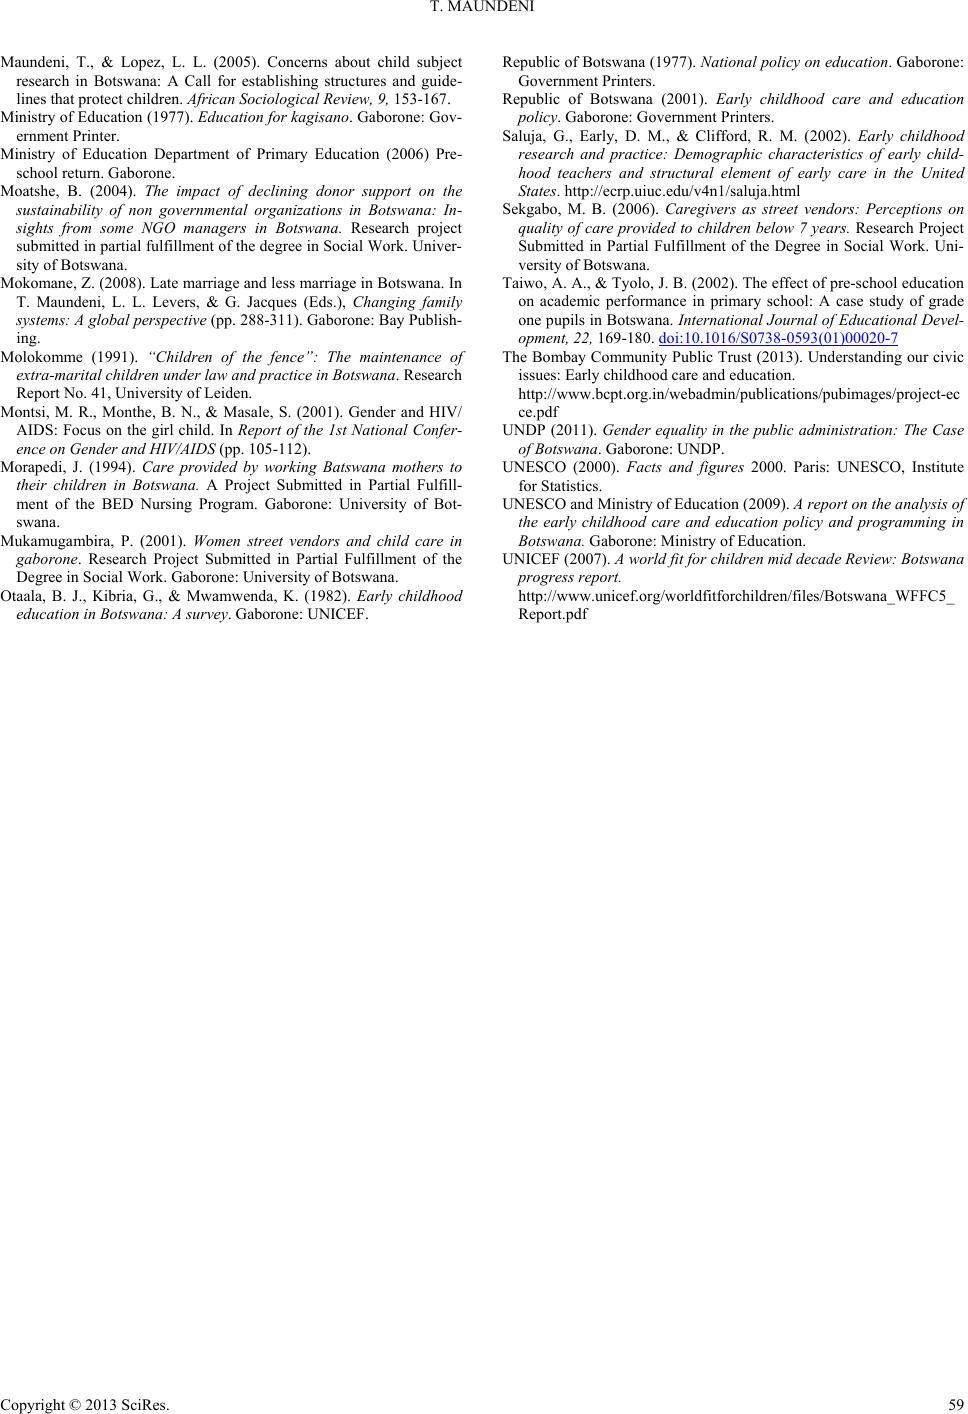 Case study writers psychology pdf